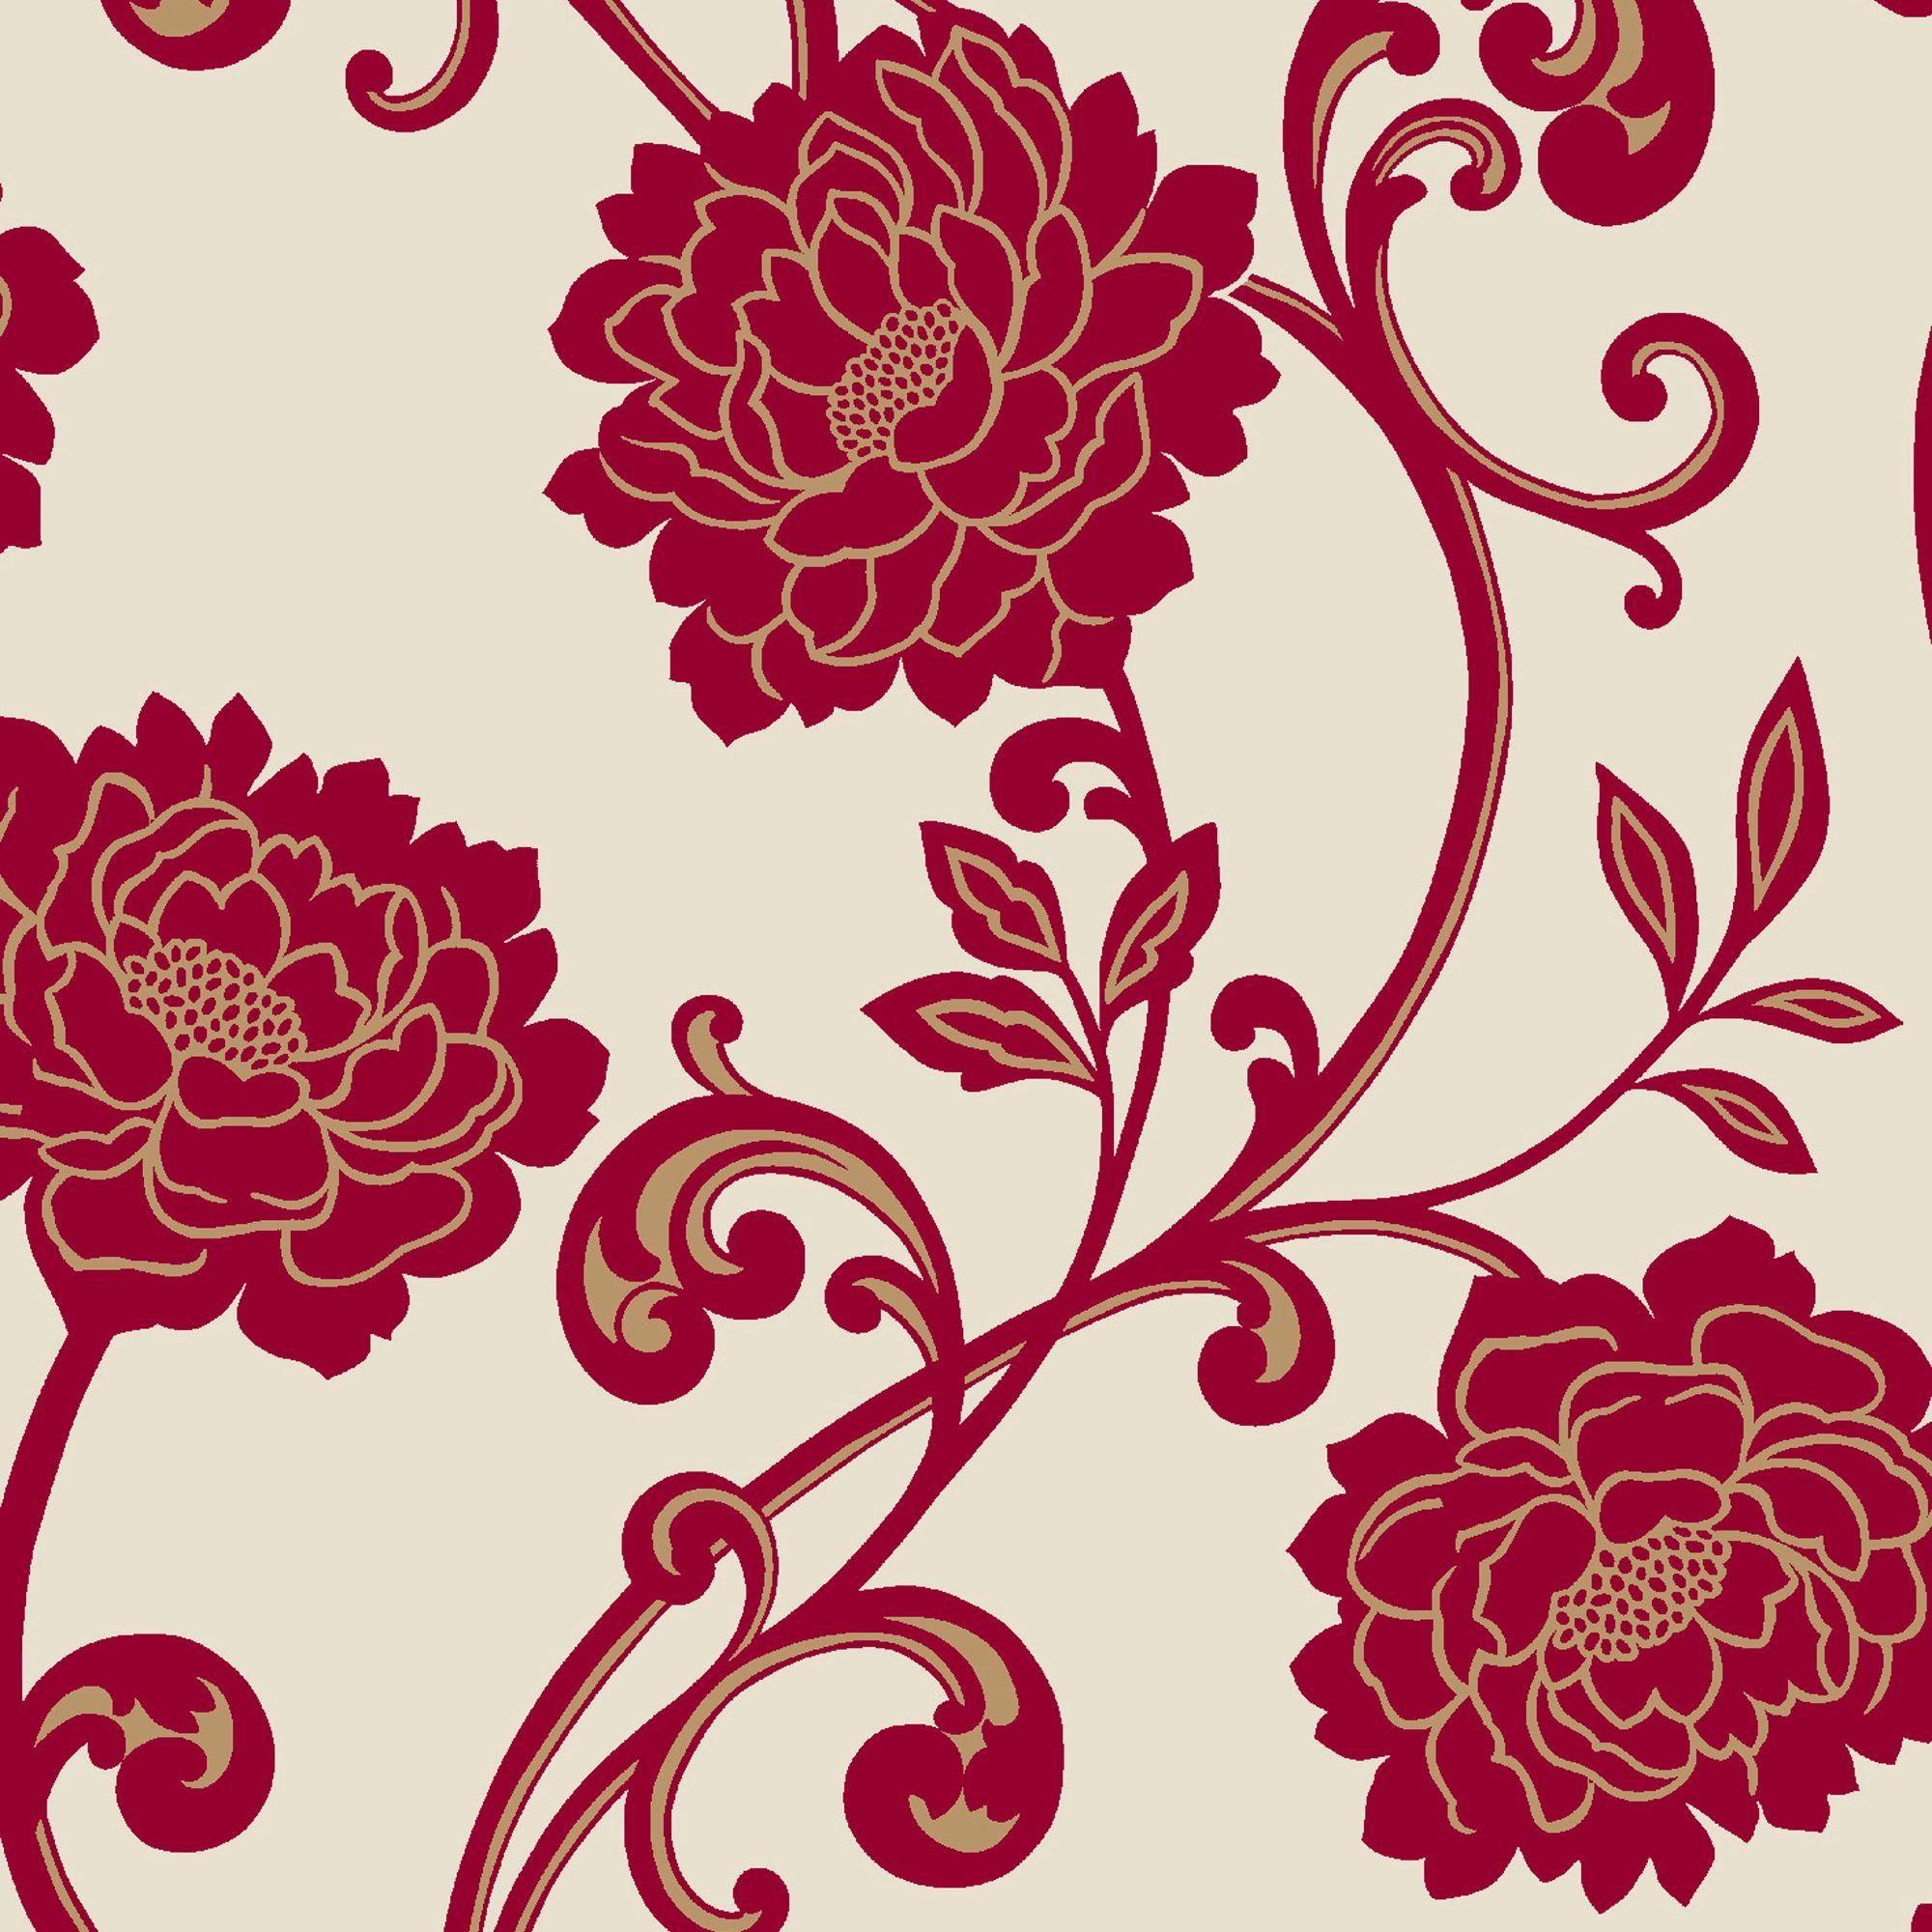 Red Wallpaper Border Google Search Black Floral Wallpaper Floral Wallpaper Border Flock Wallpaper